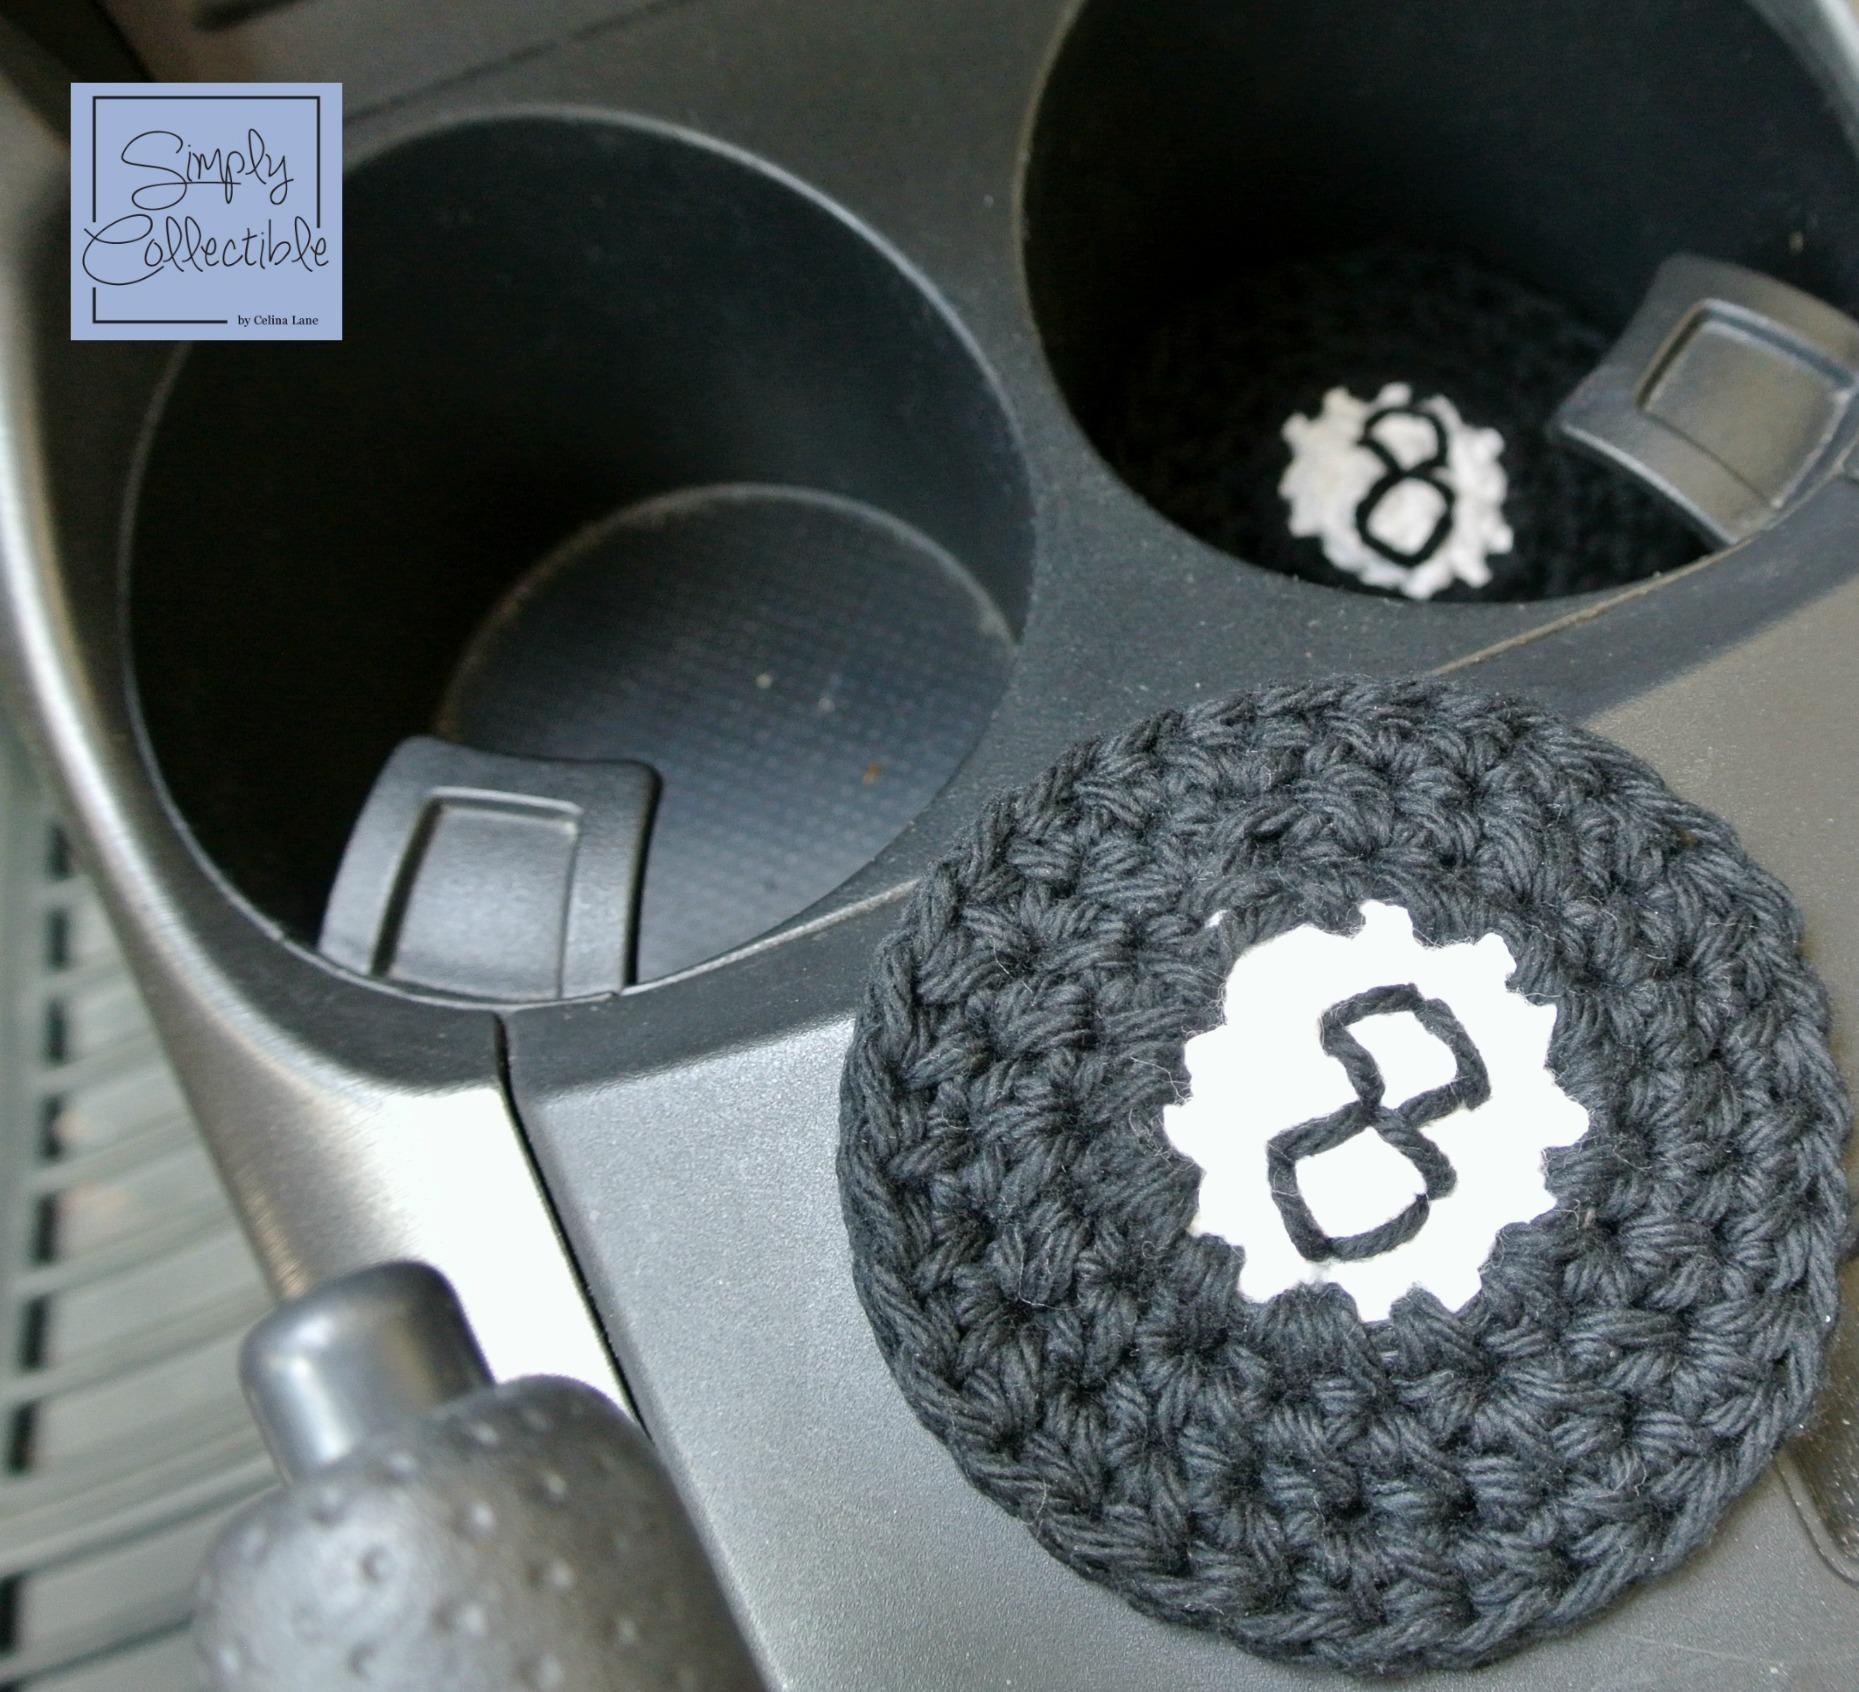 8-ball Applique or Coaster Crochet Pattern • Simply Collectible